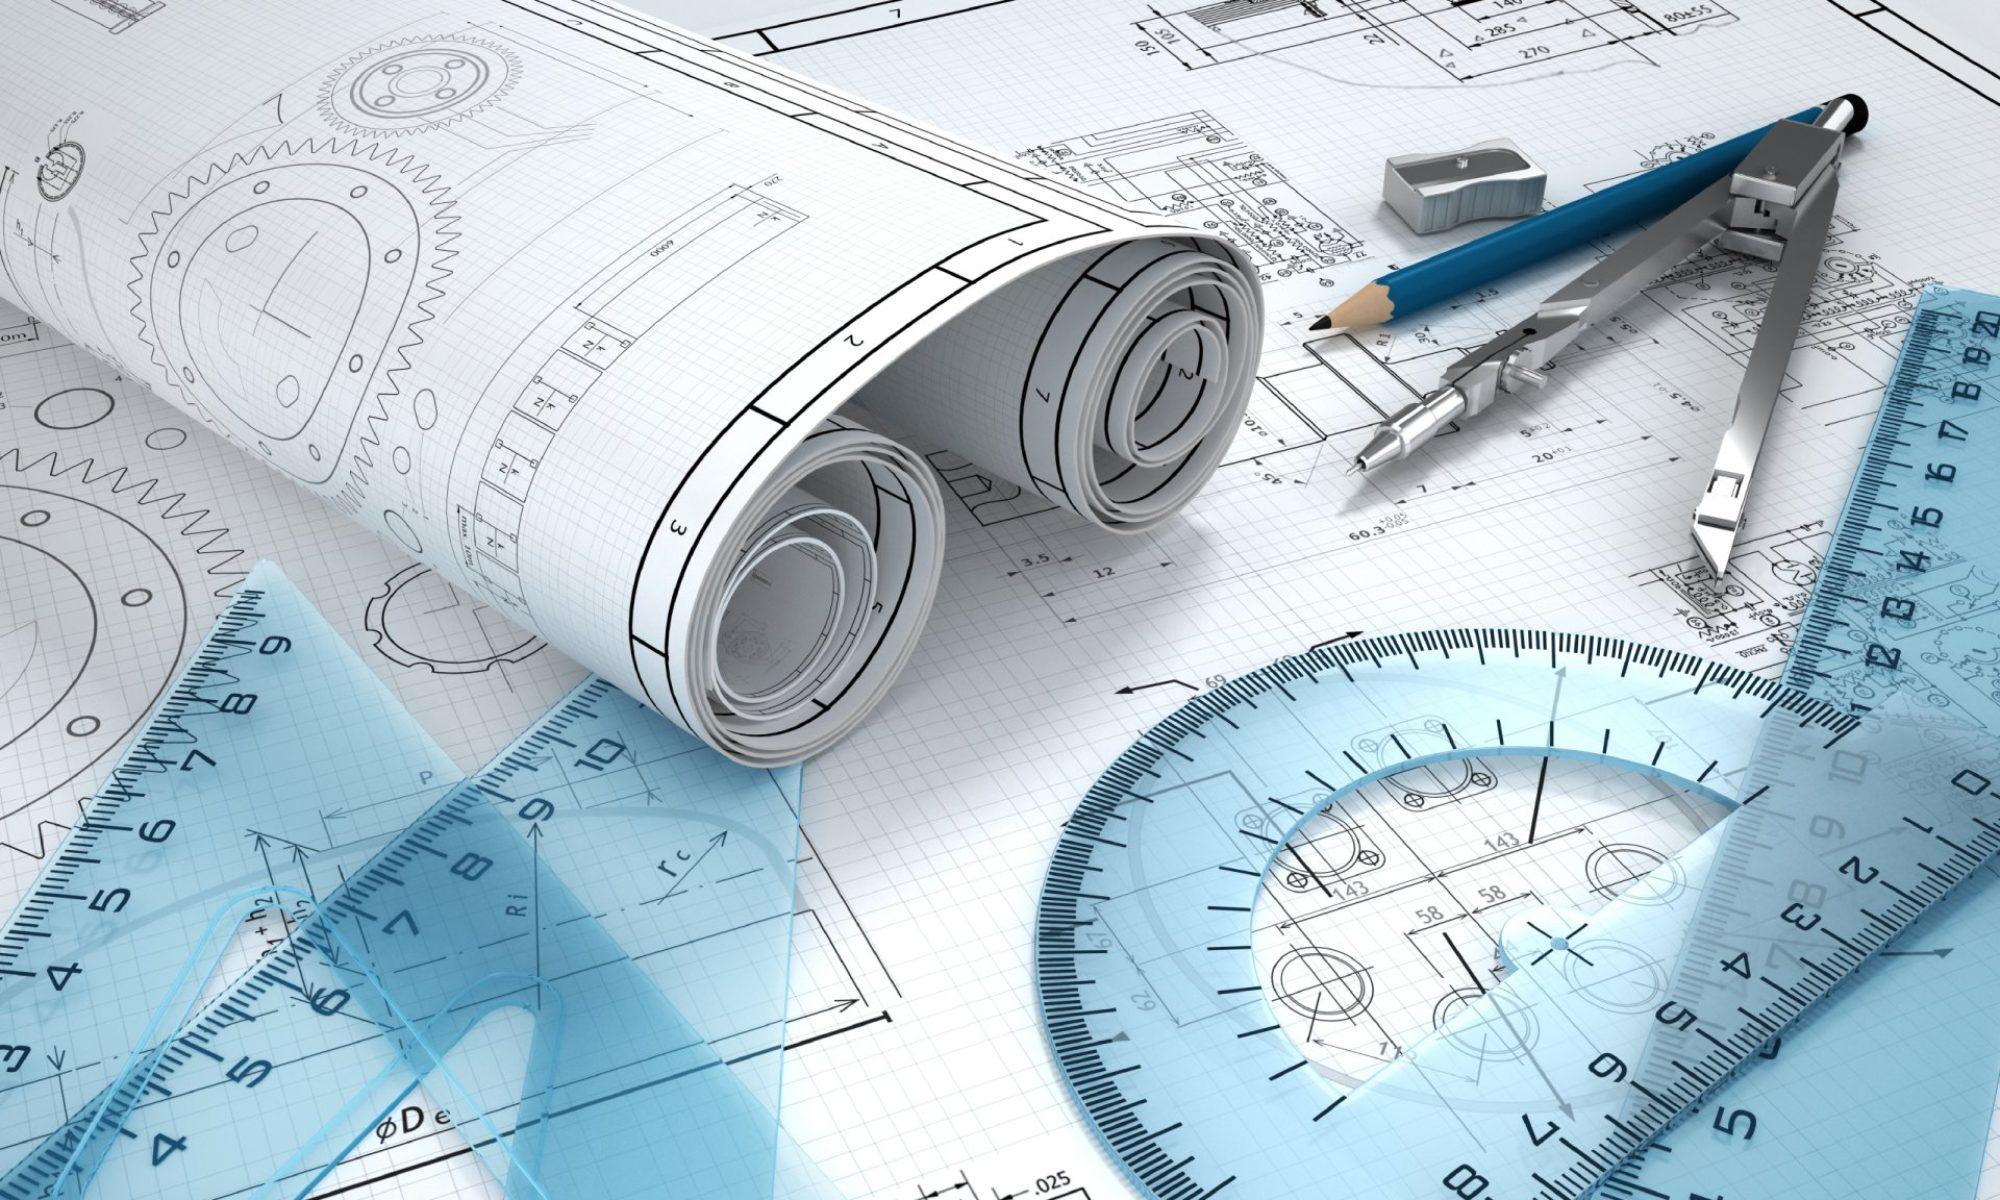 www.mytechnologie.de